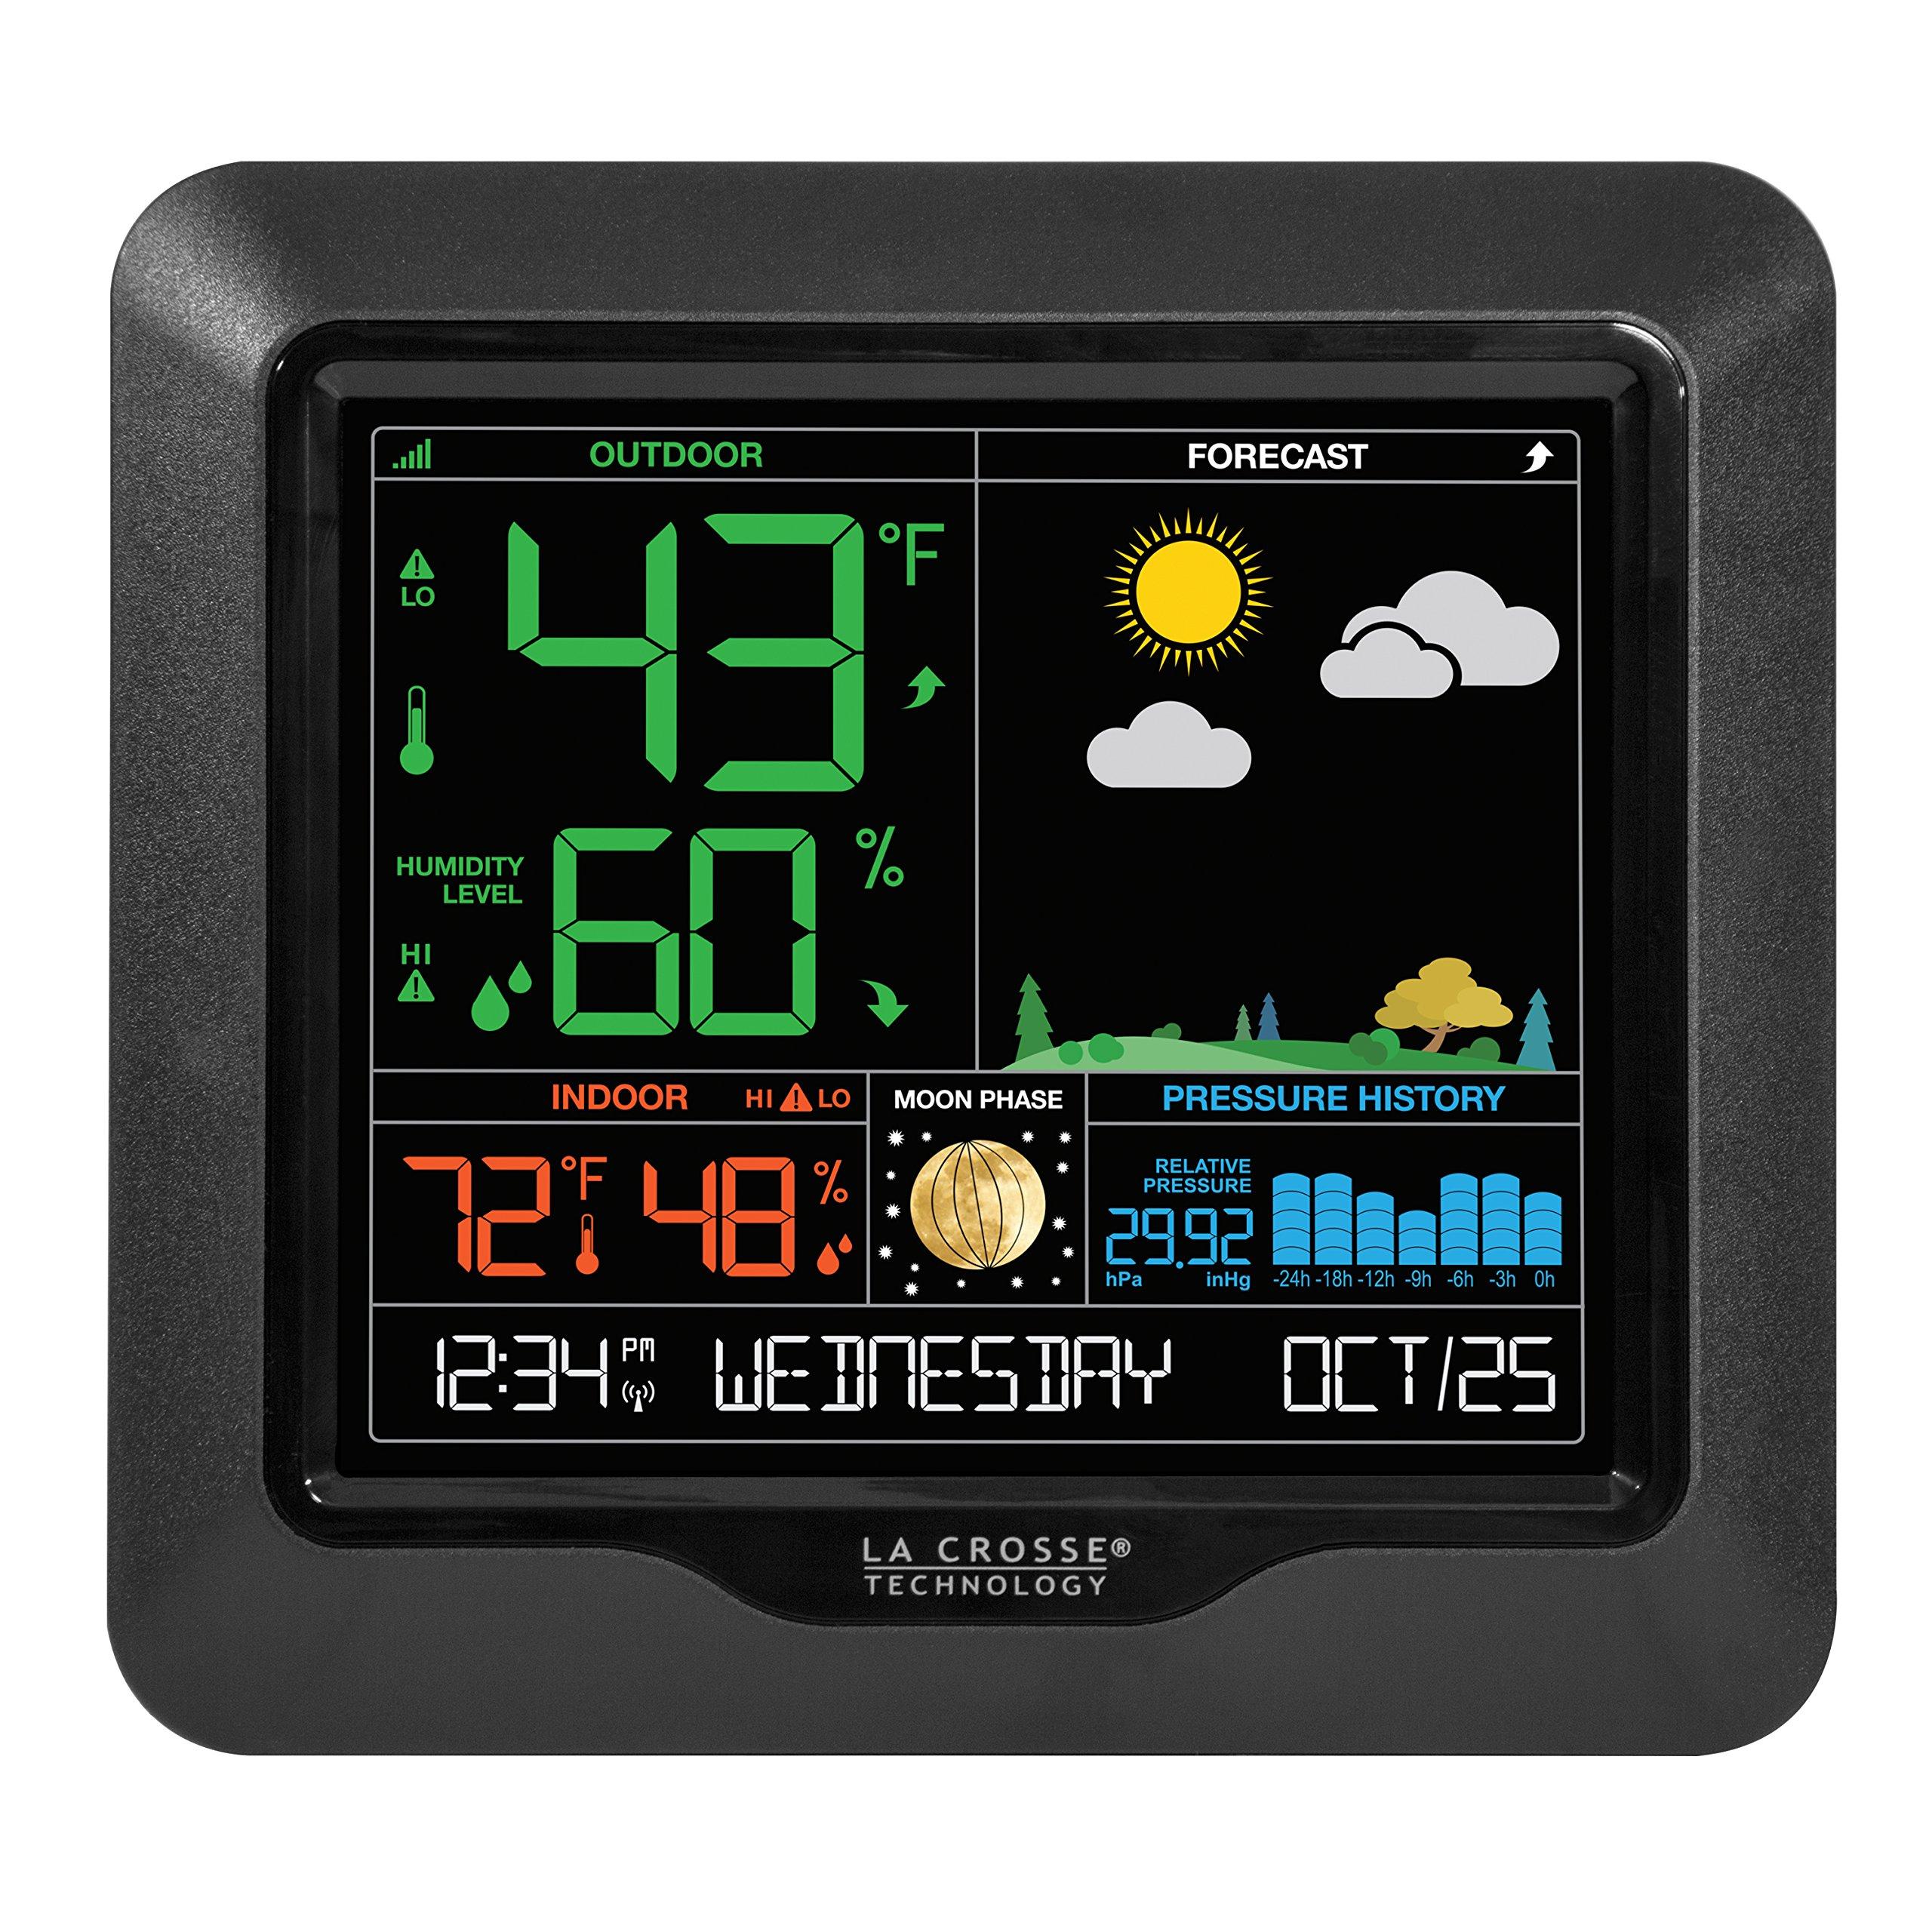 La Crosse Technology S84107 Color Forecast Station, Black by La Crosse Technology